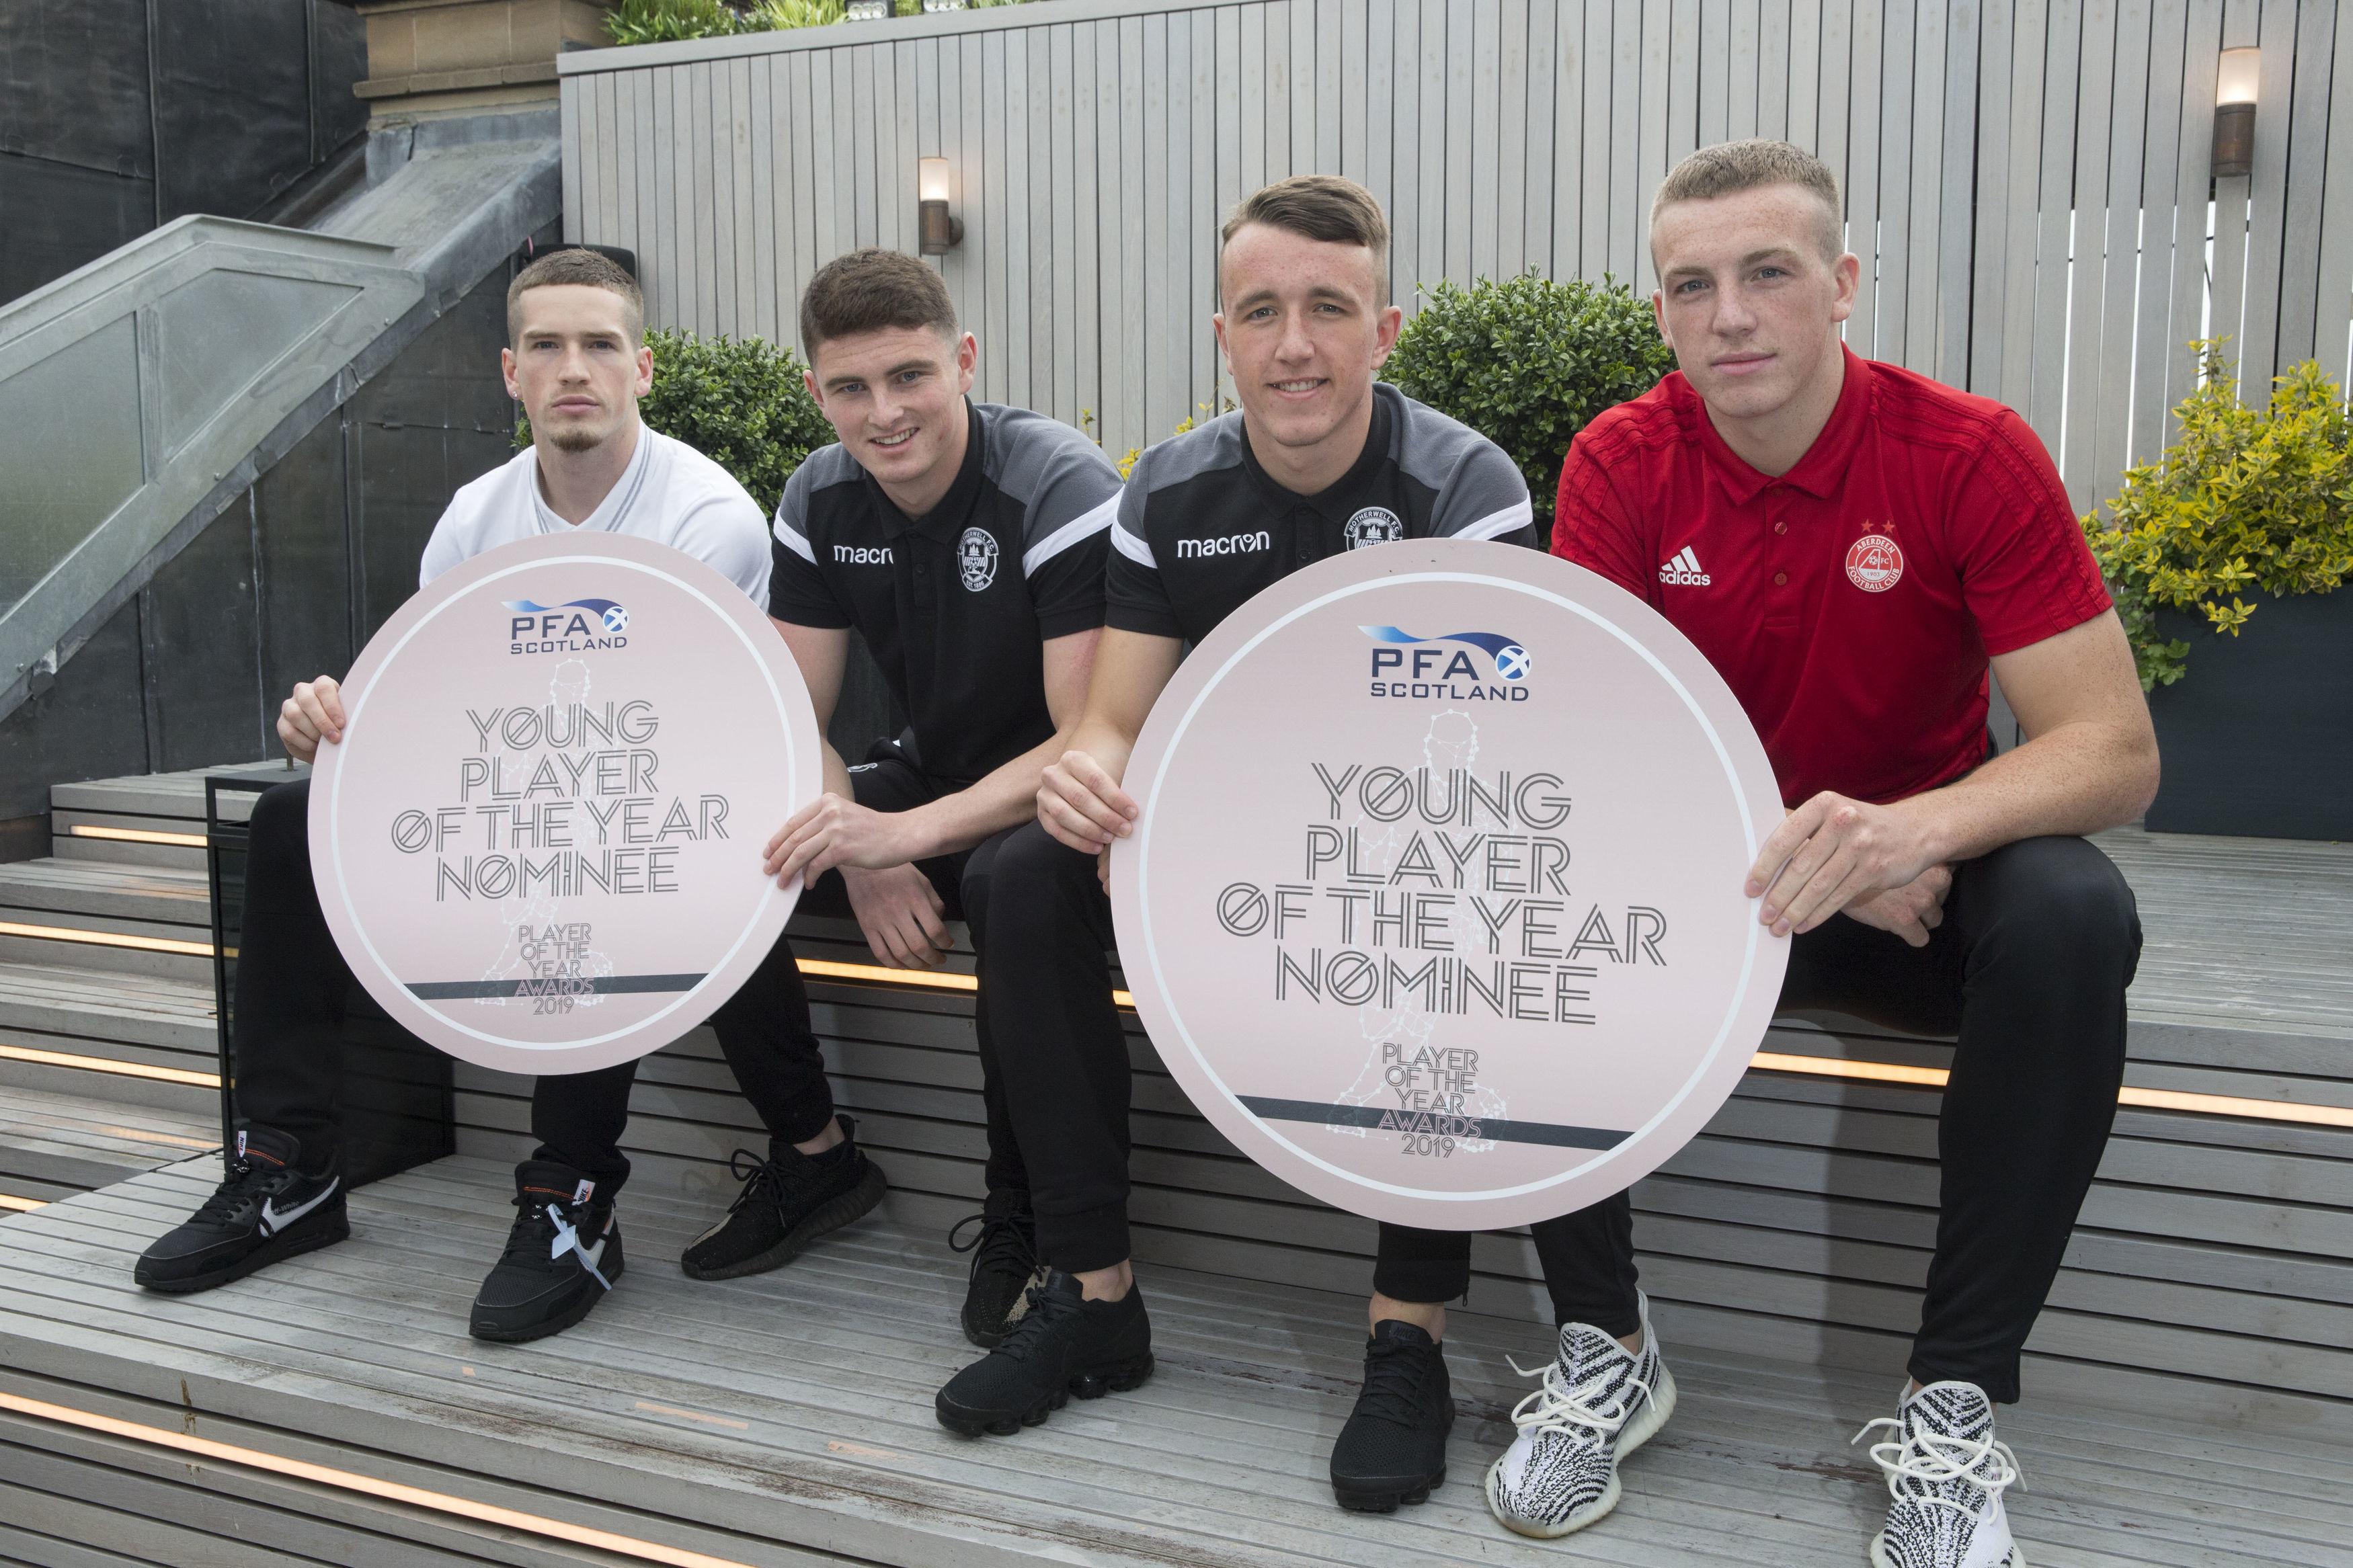 Aberdeen's Lewis Ferguson, Motherwell's Jake Hastie, Rangers' Ryan Kent and Motherwell's David Turnbull.